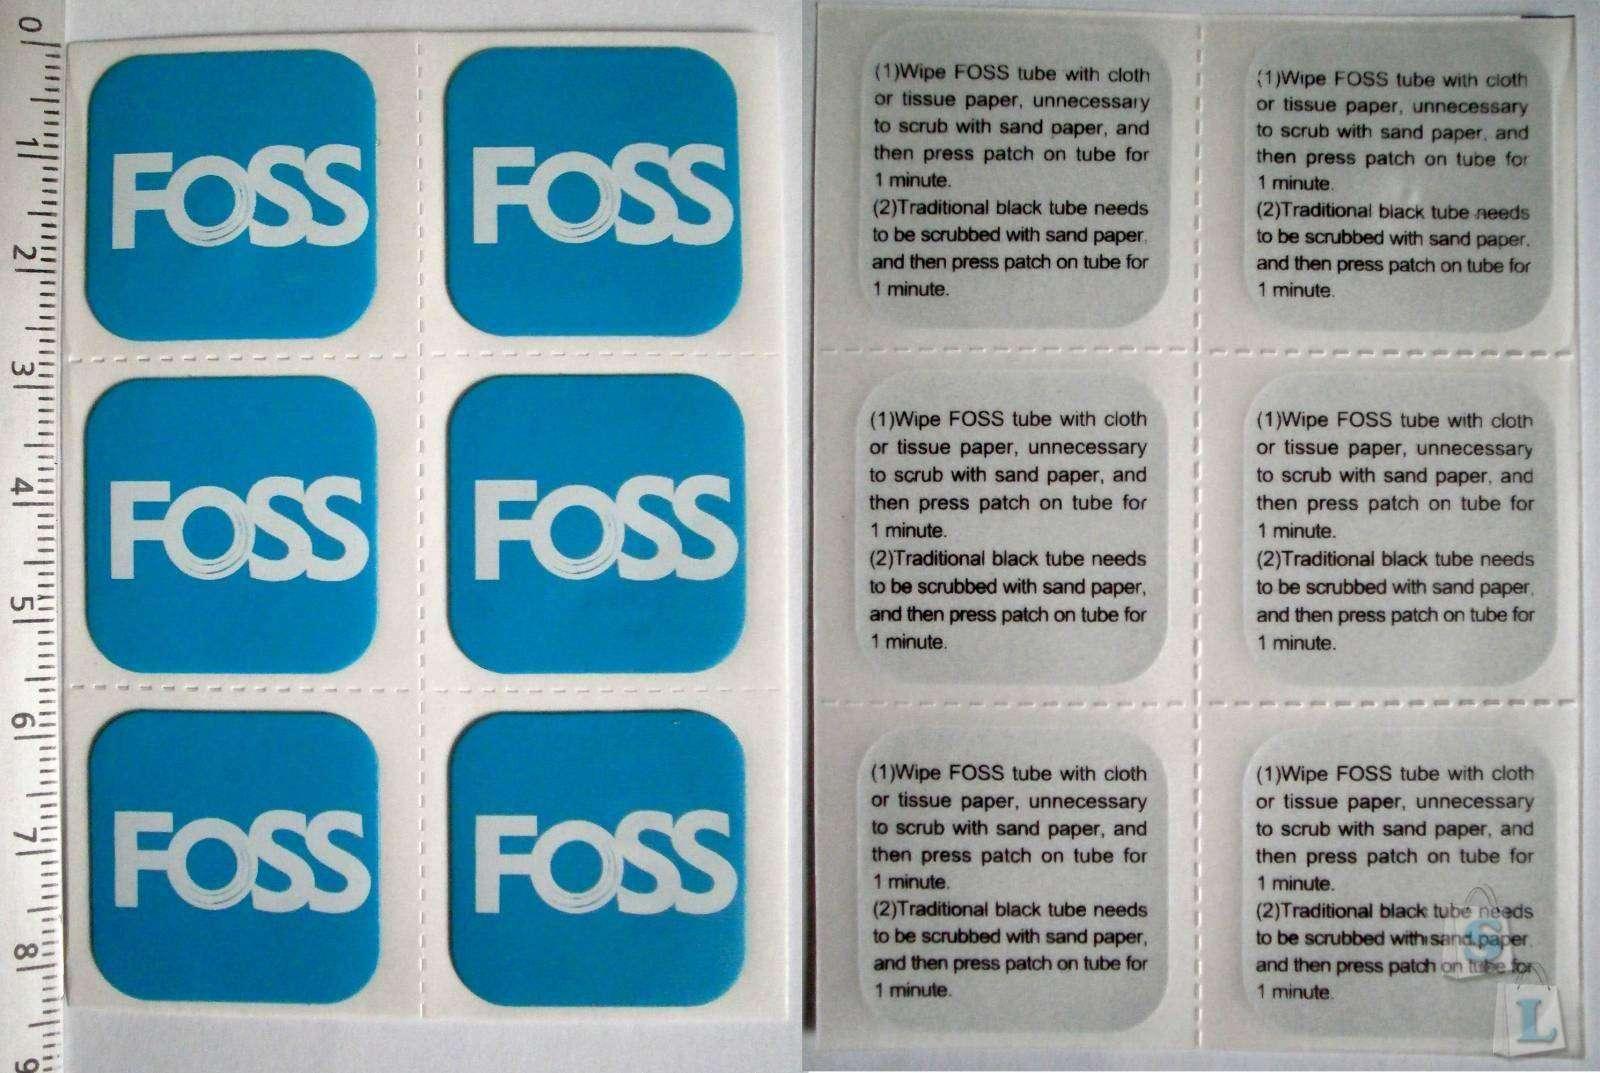 Aliexpress: Велосипедная камера FOSS с защитой от сдувания + латки